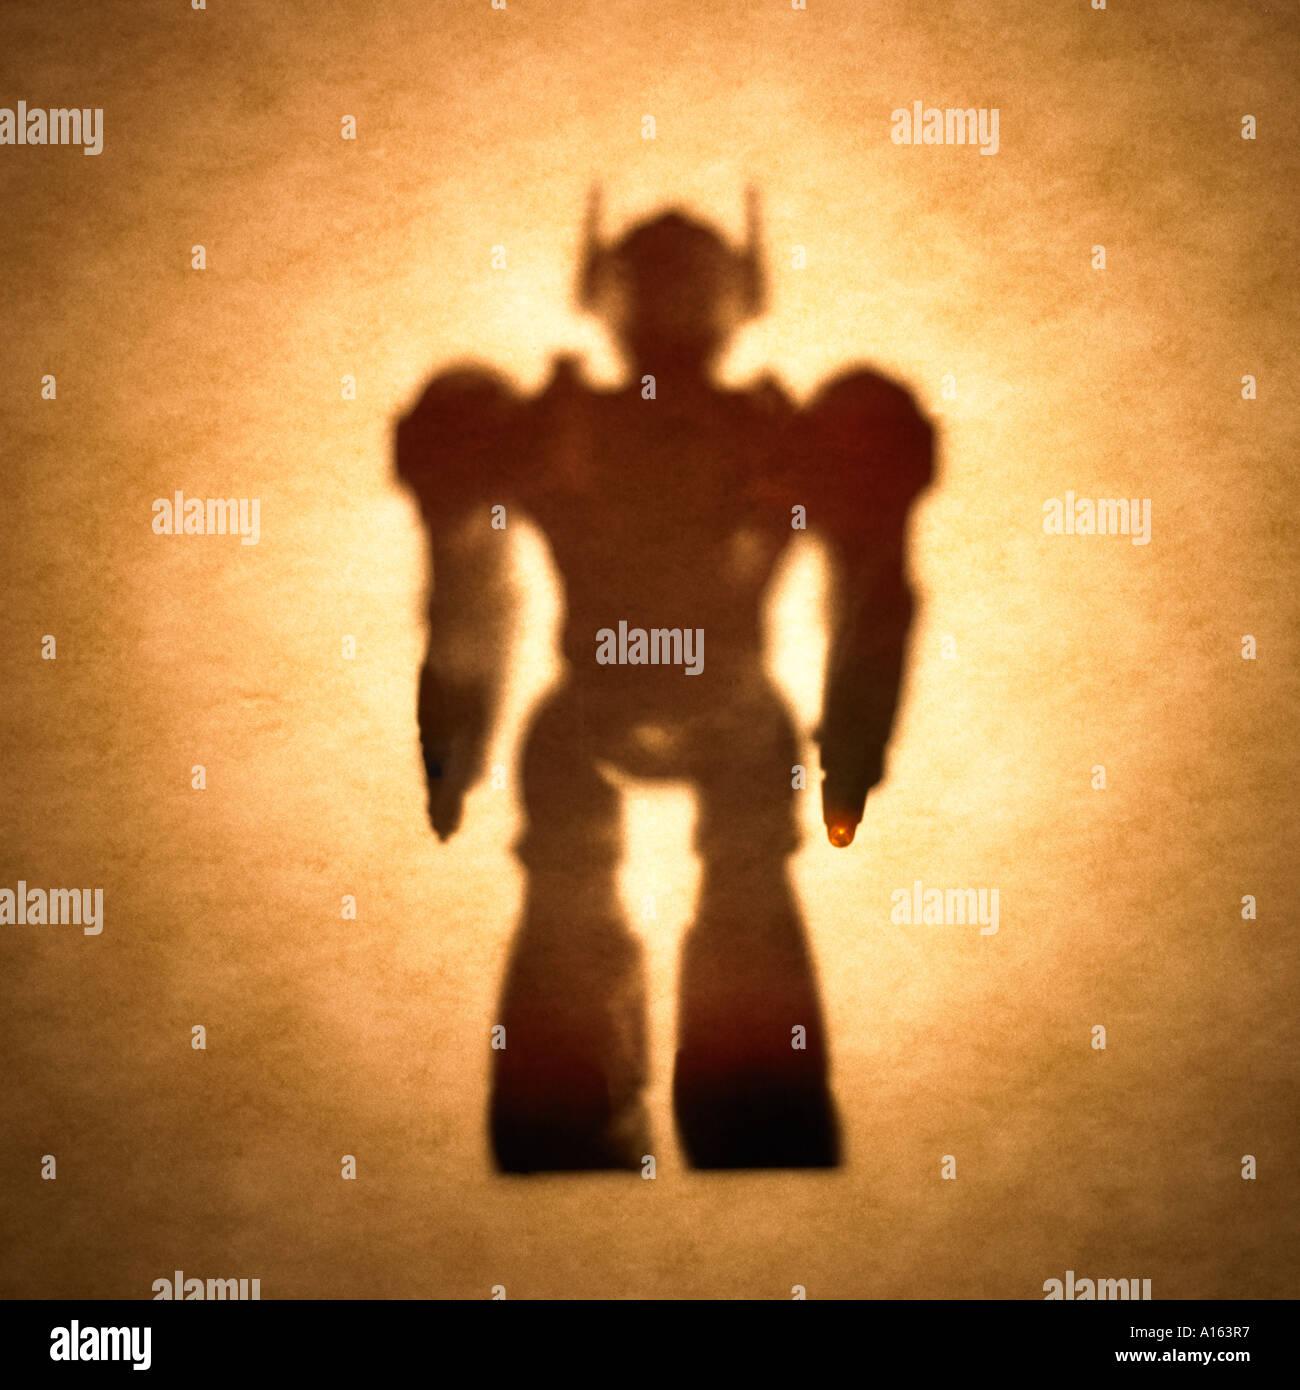 Robot - Stock Image